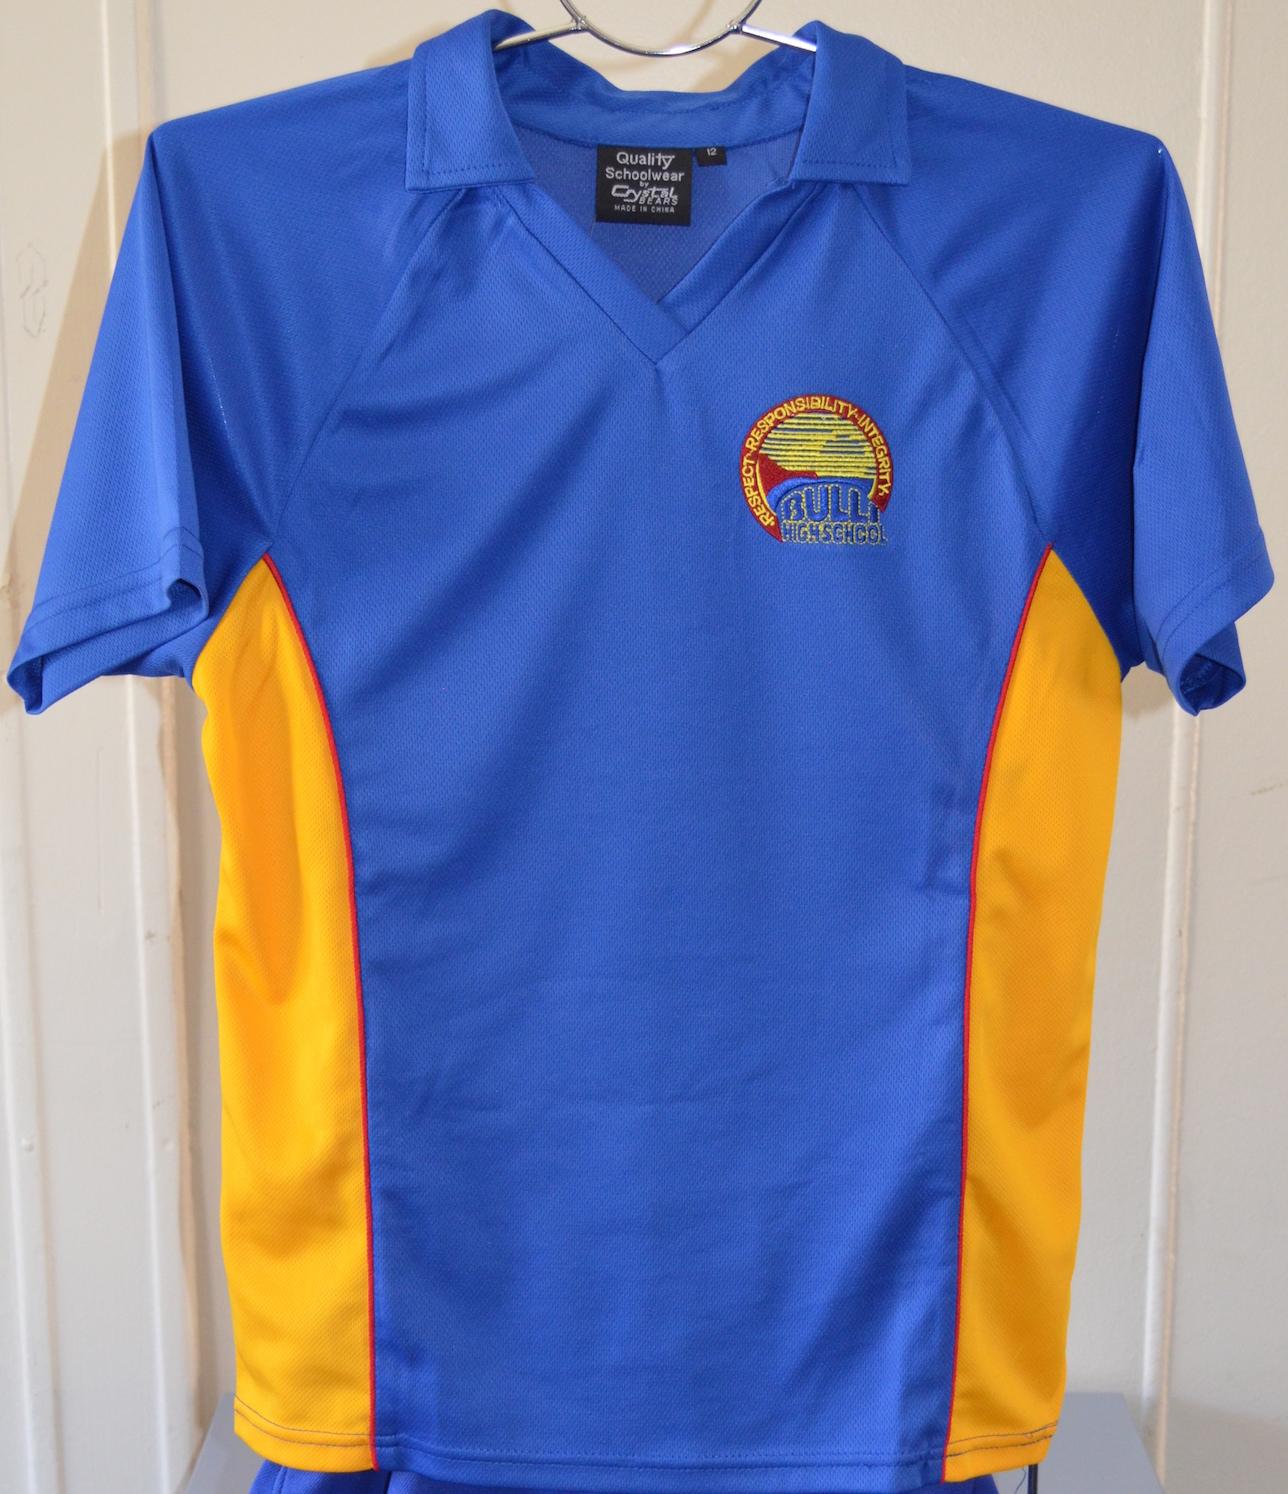 Sports shirt